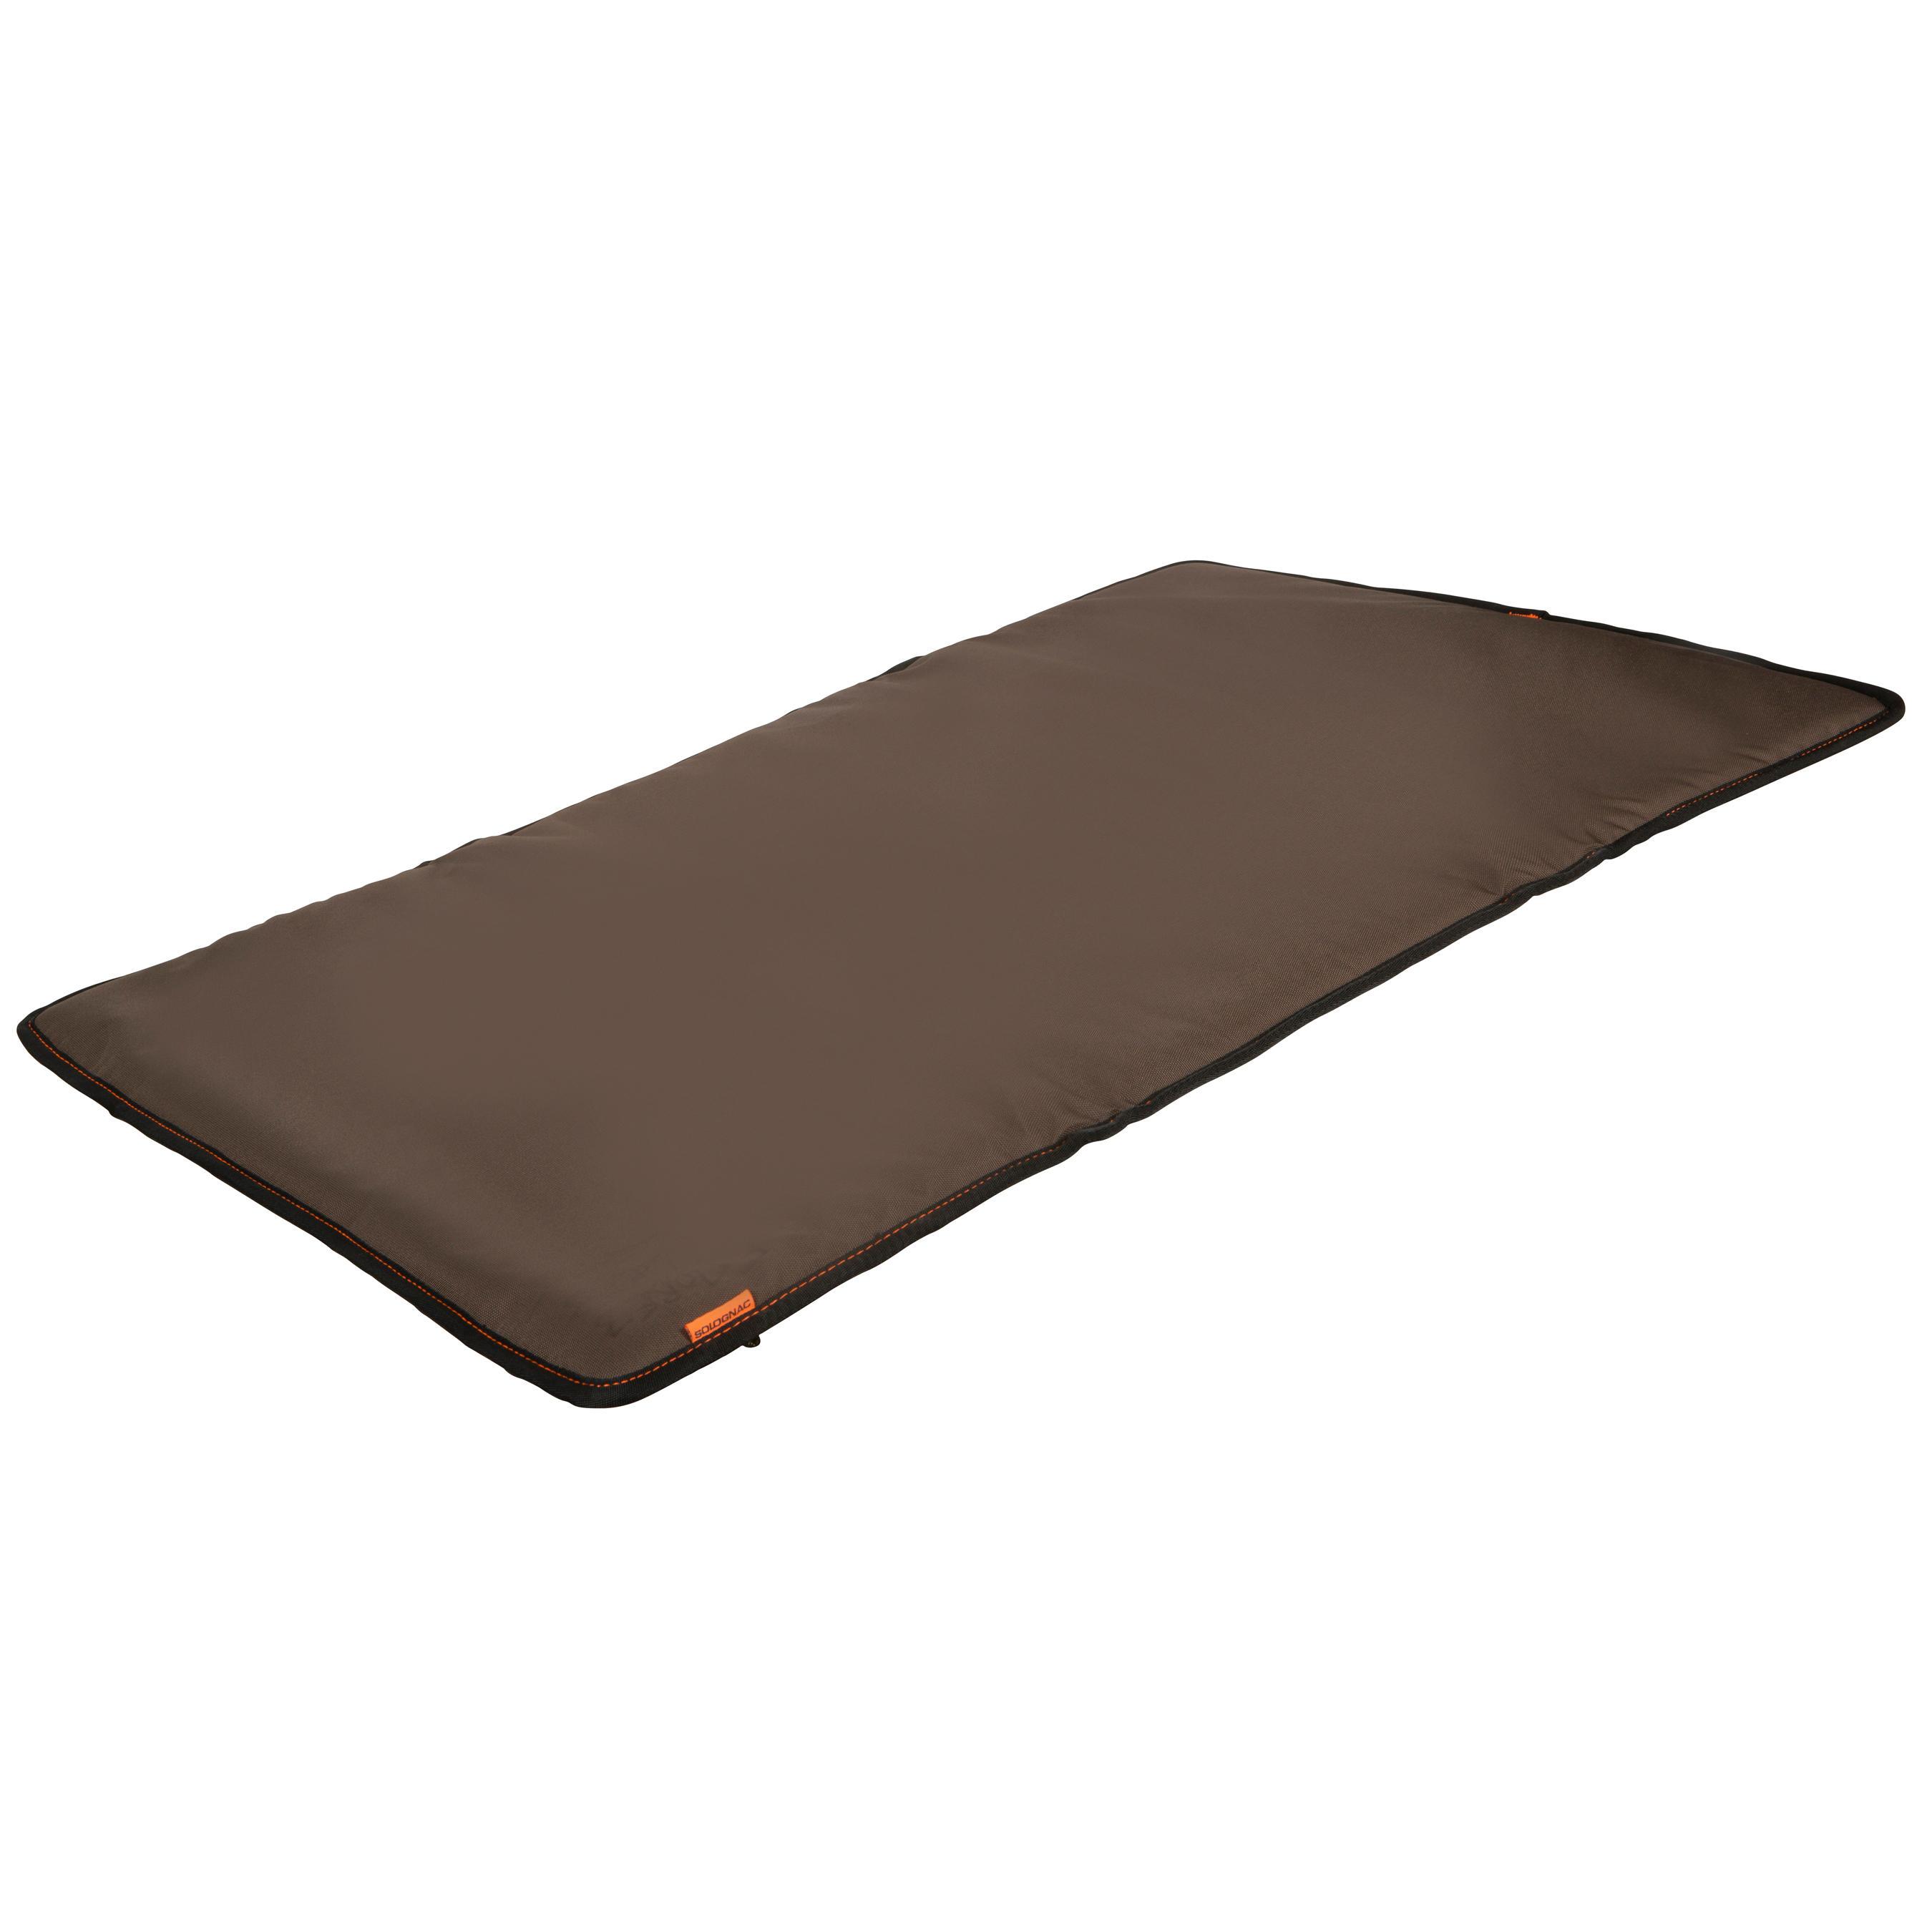 Dog mat 100 - brown